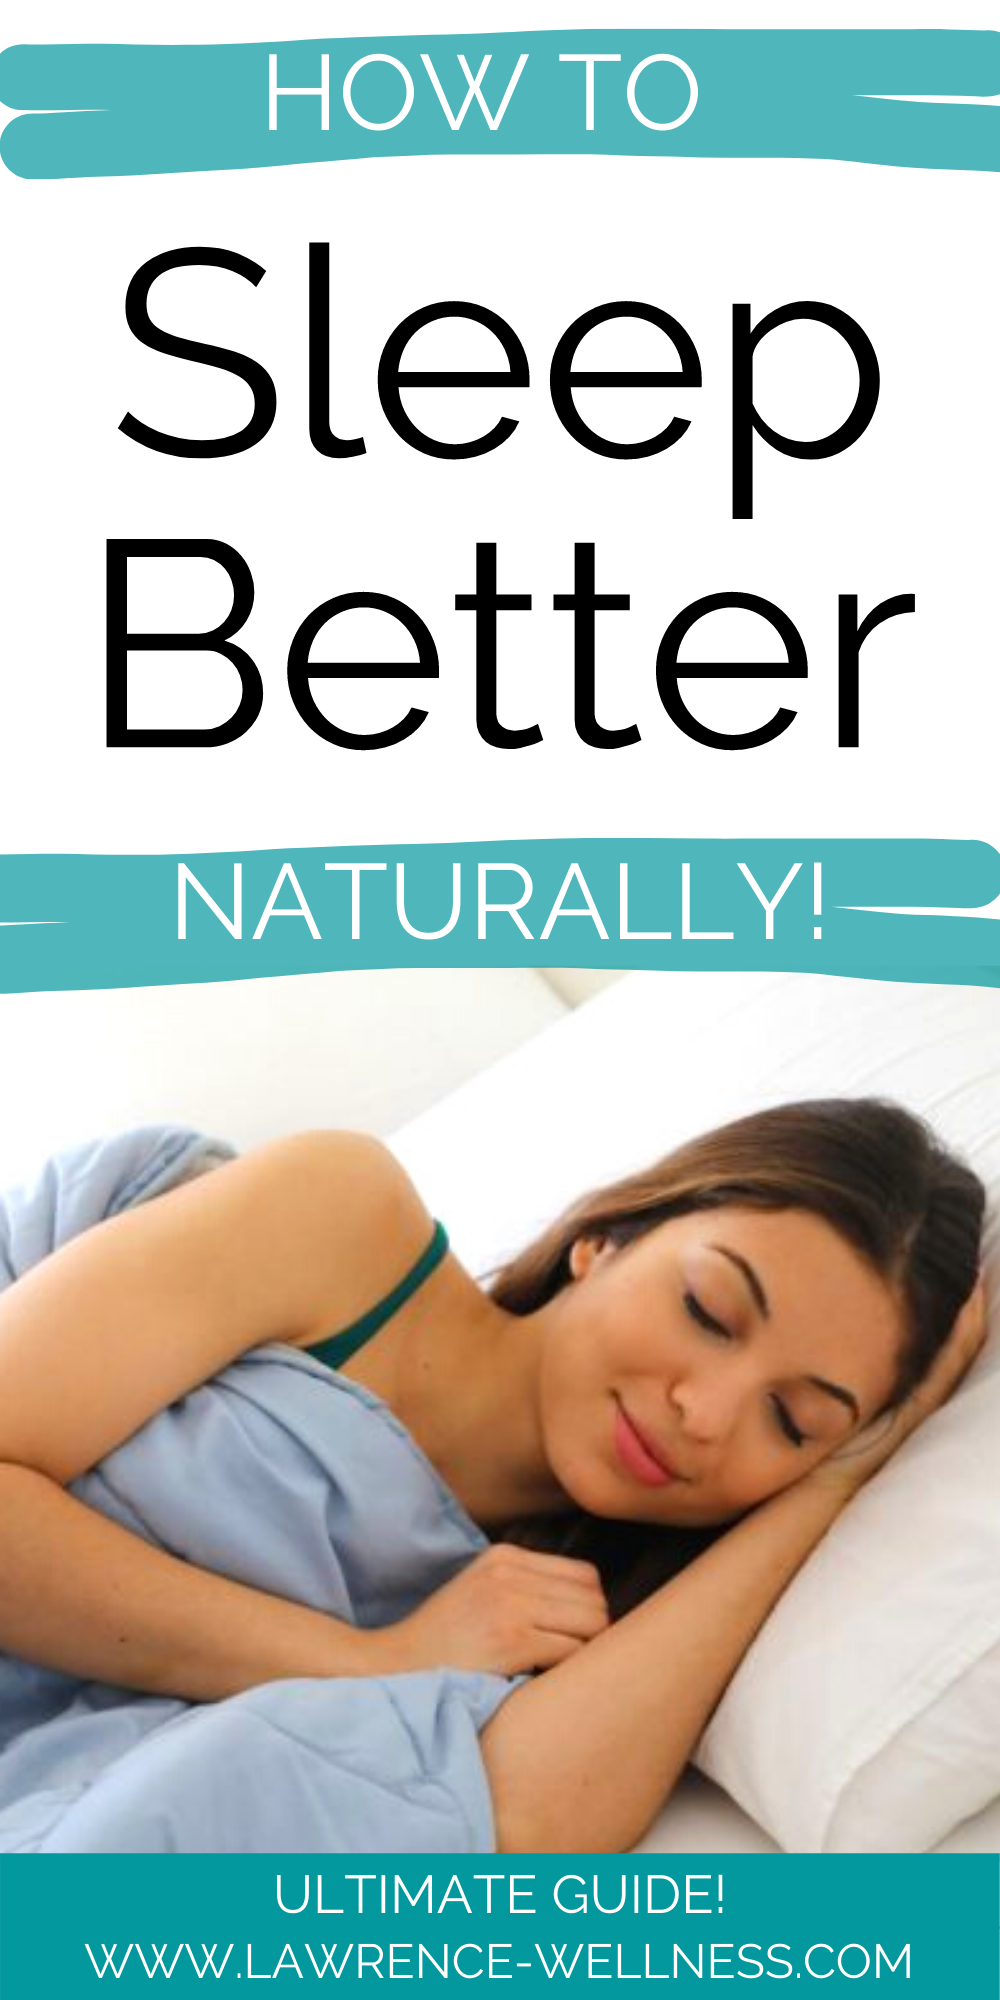 how-to-sleep-better-naturally